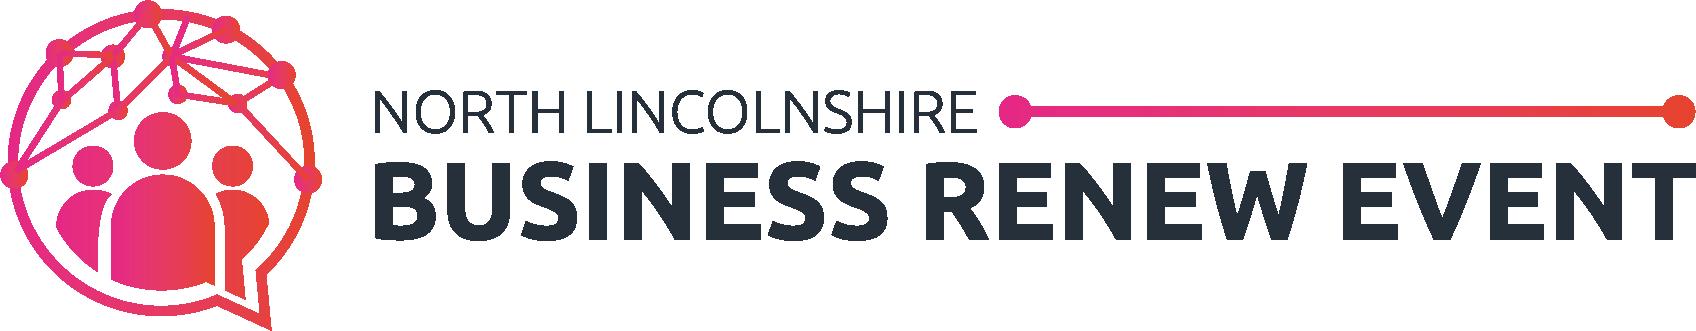 North Lincolnshire Business Renew Event 2021 Logo